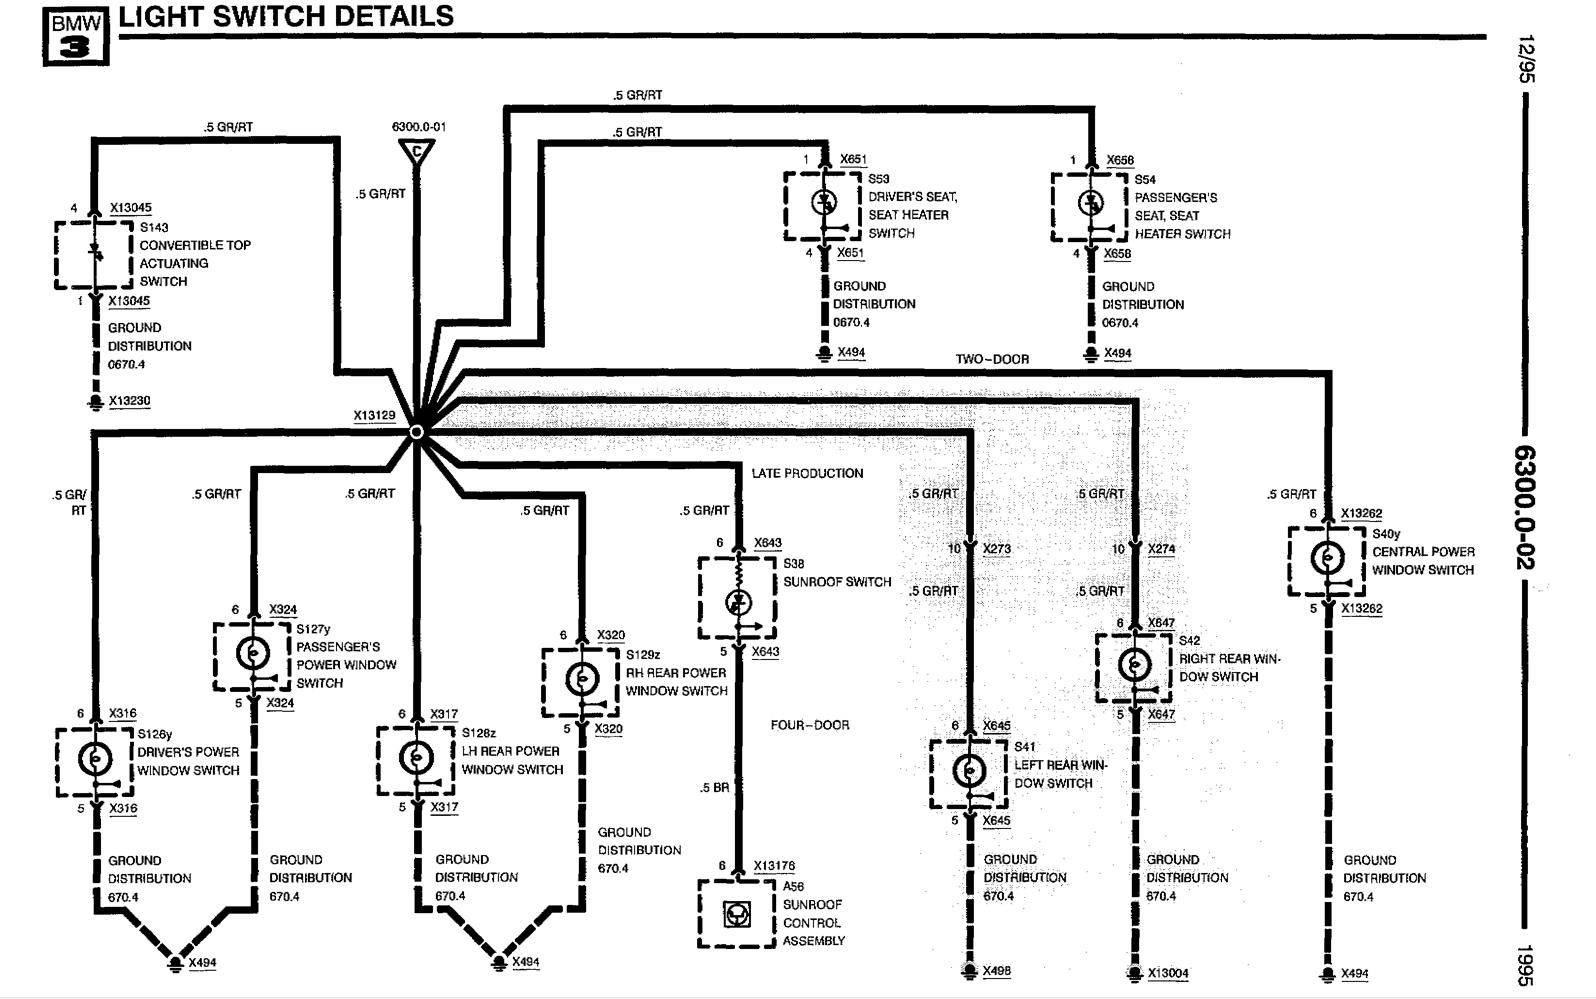 medium resolution of bmw wiring diagram e36 wiring diagram third level bmw e38 radio wiring diagram 98 e36 wiring